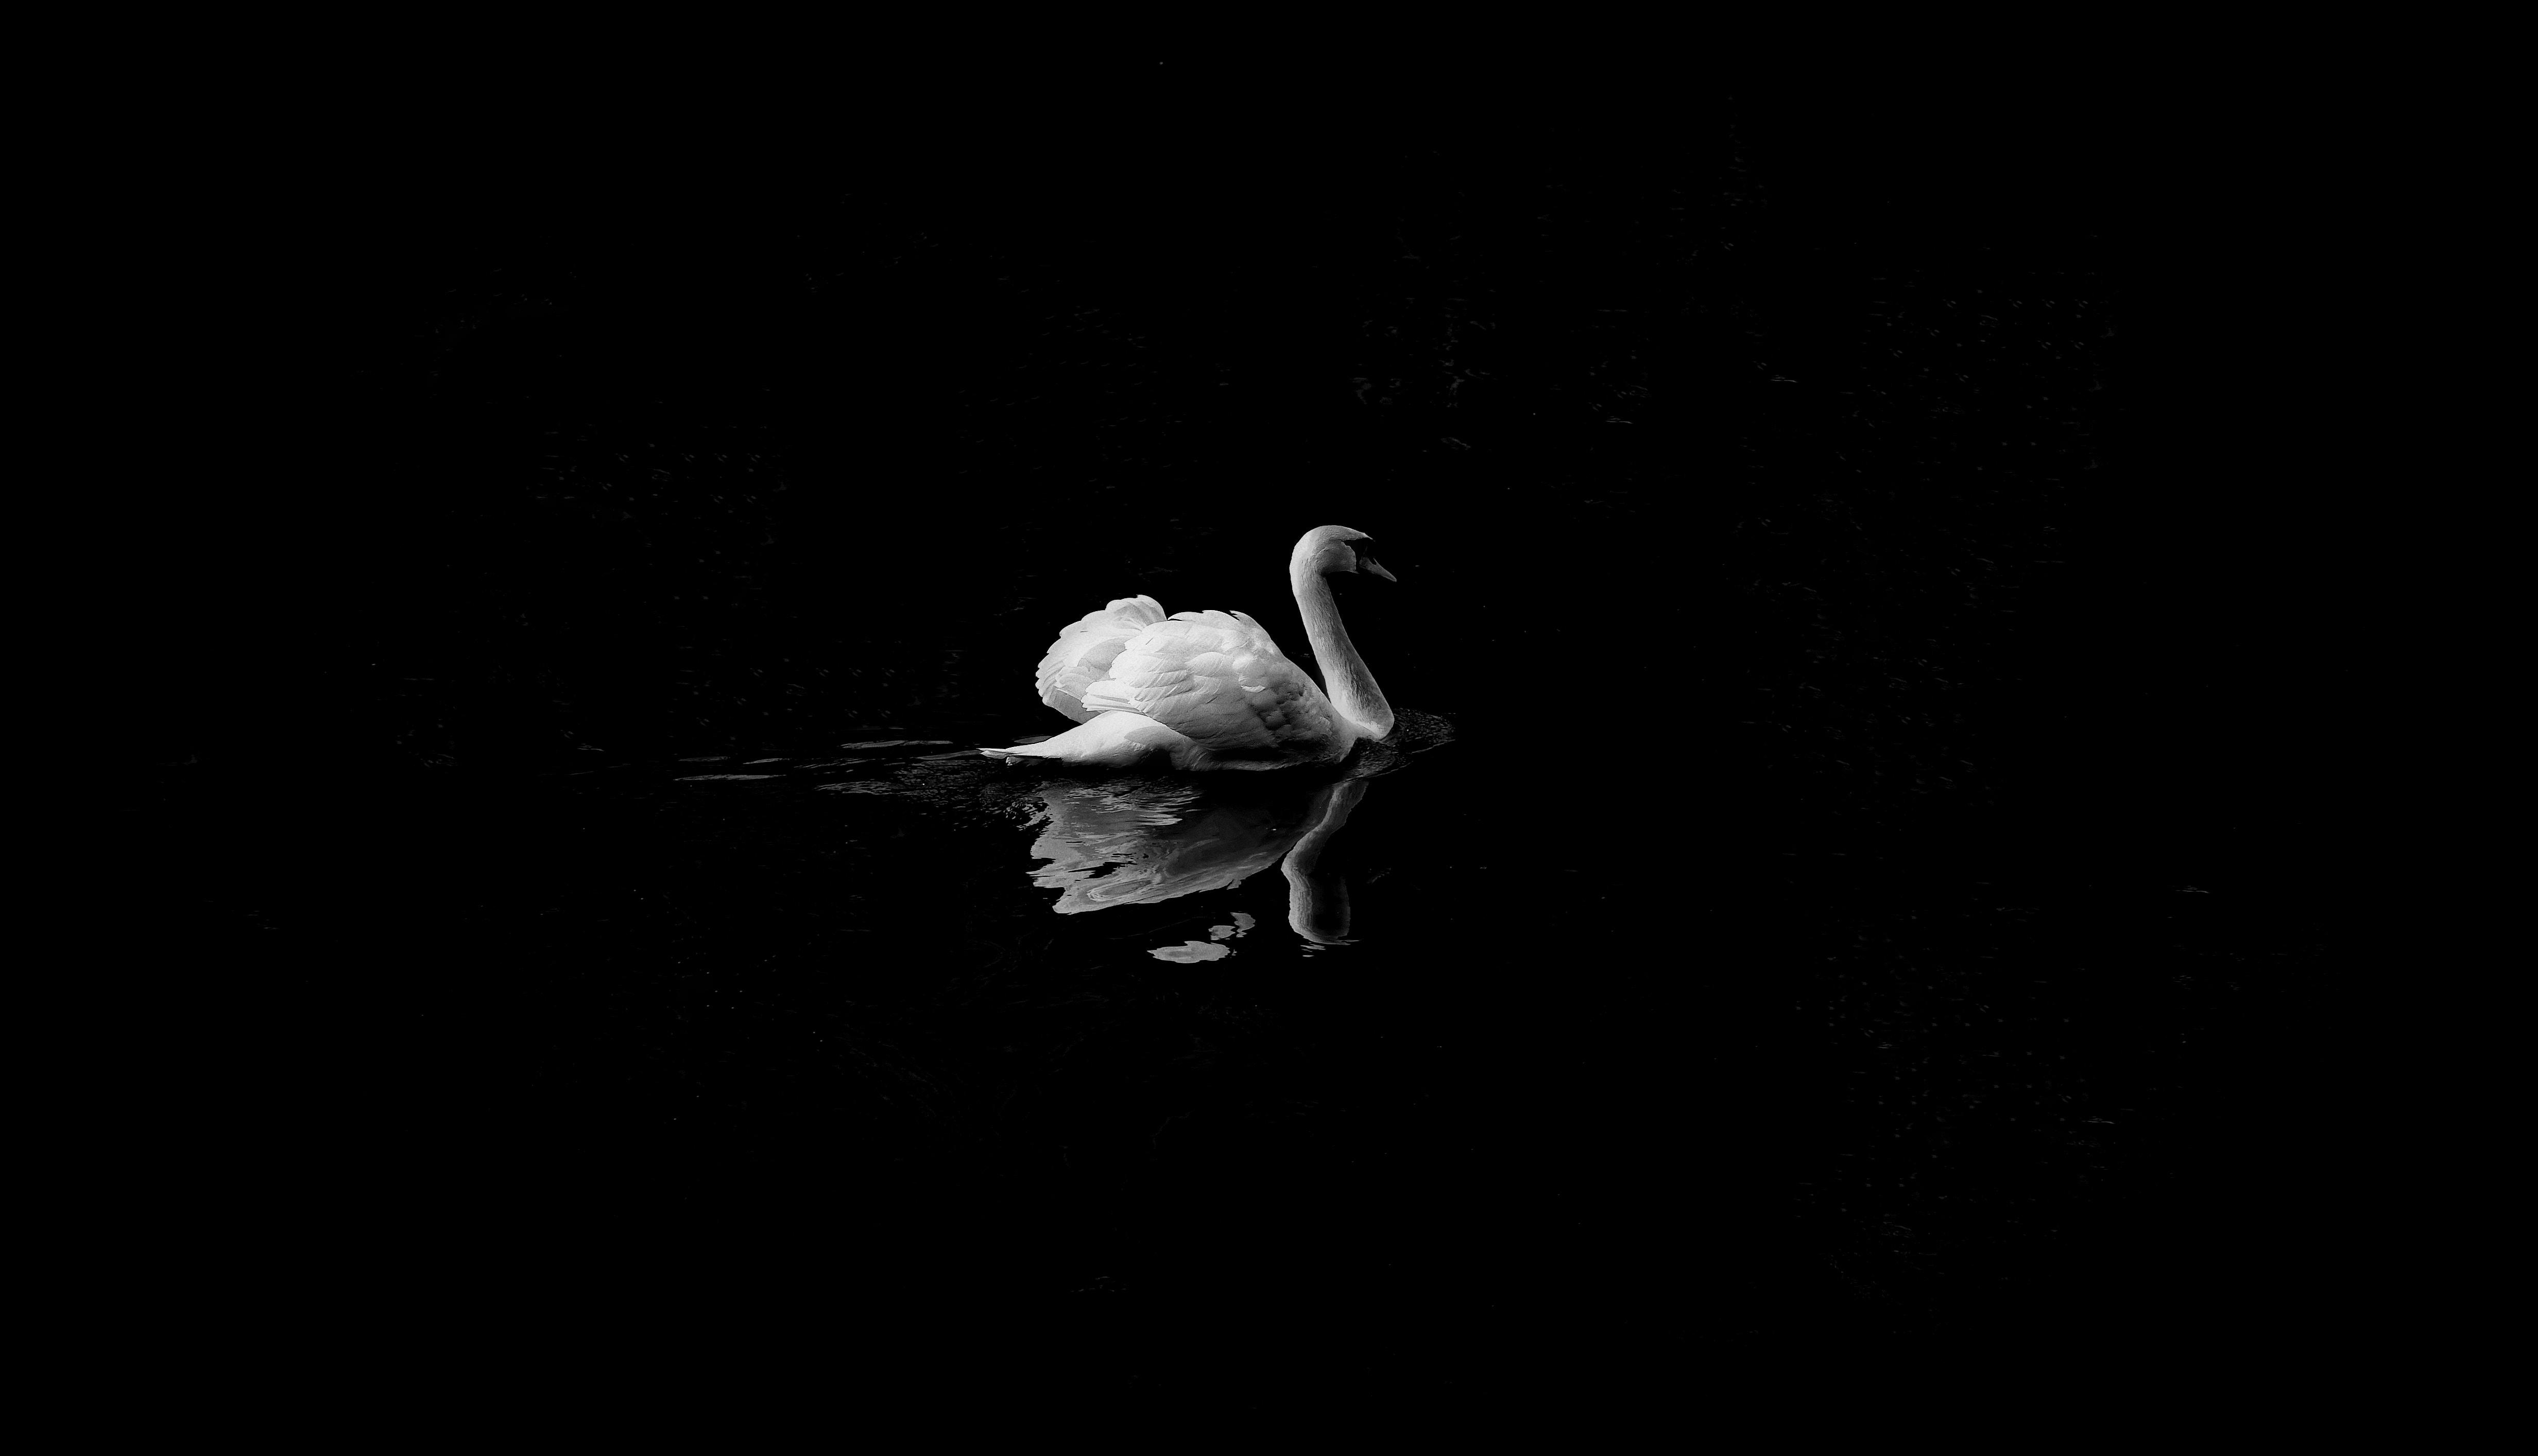 Animal, Black And White iPhone Wallpaper - iDrop News